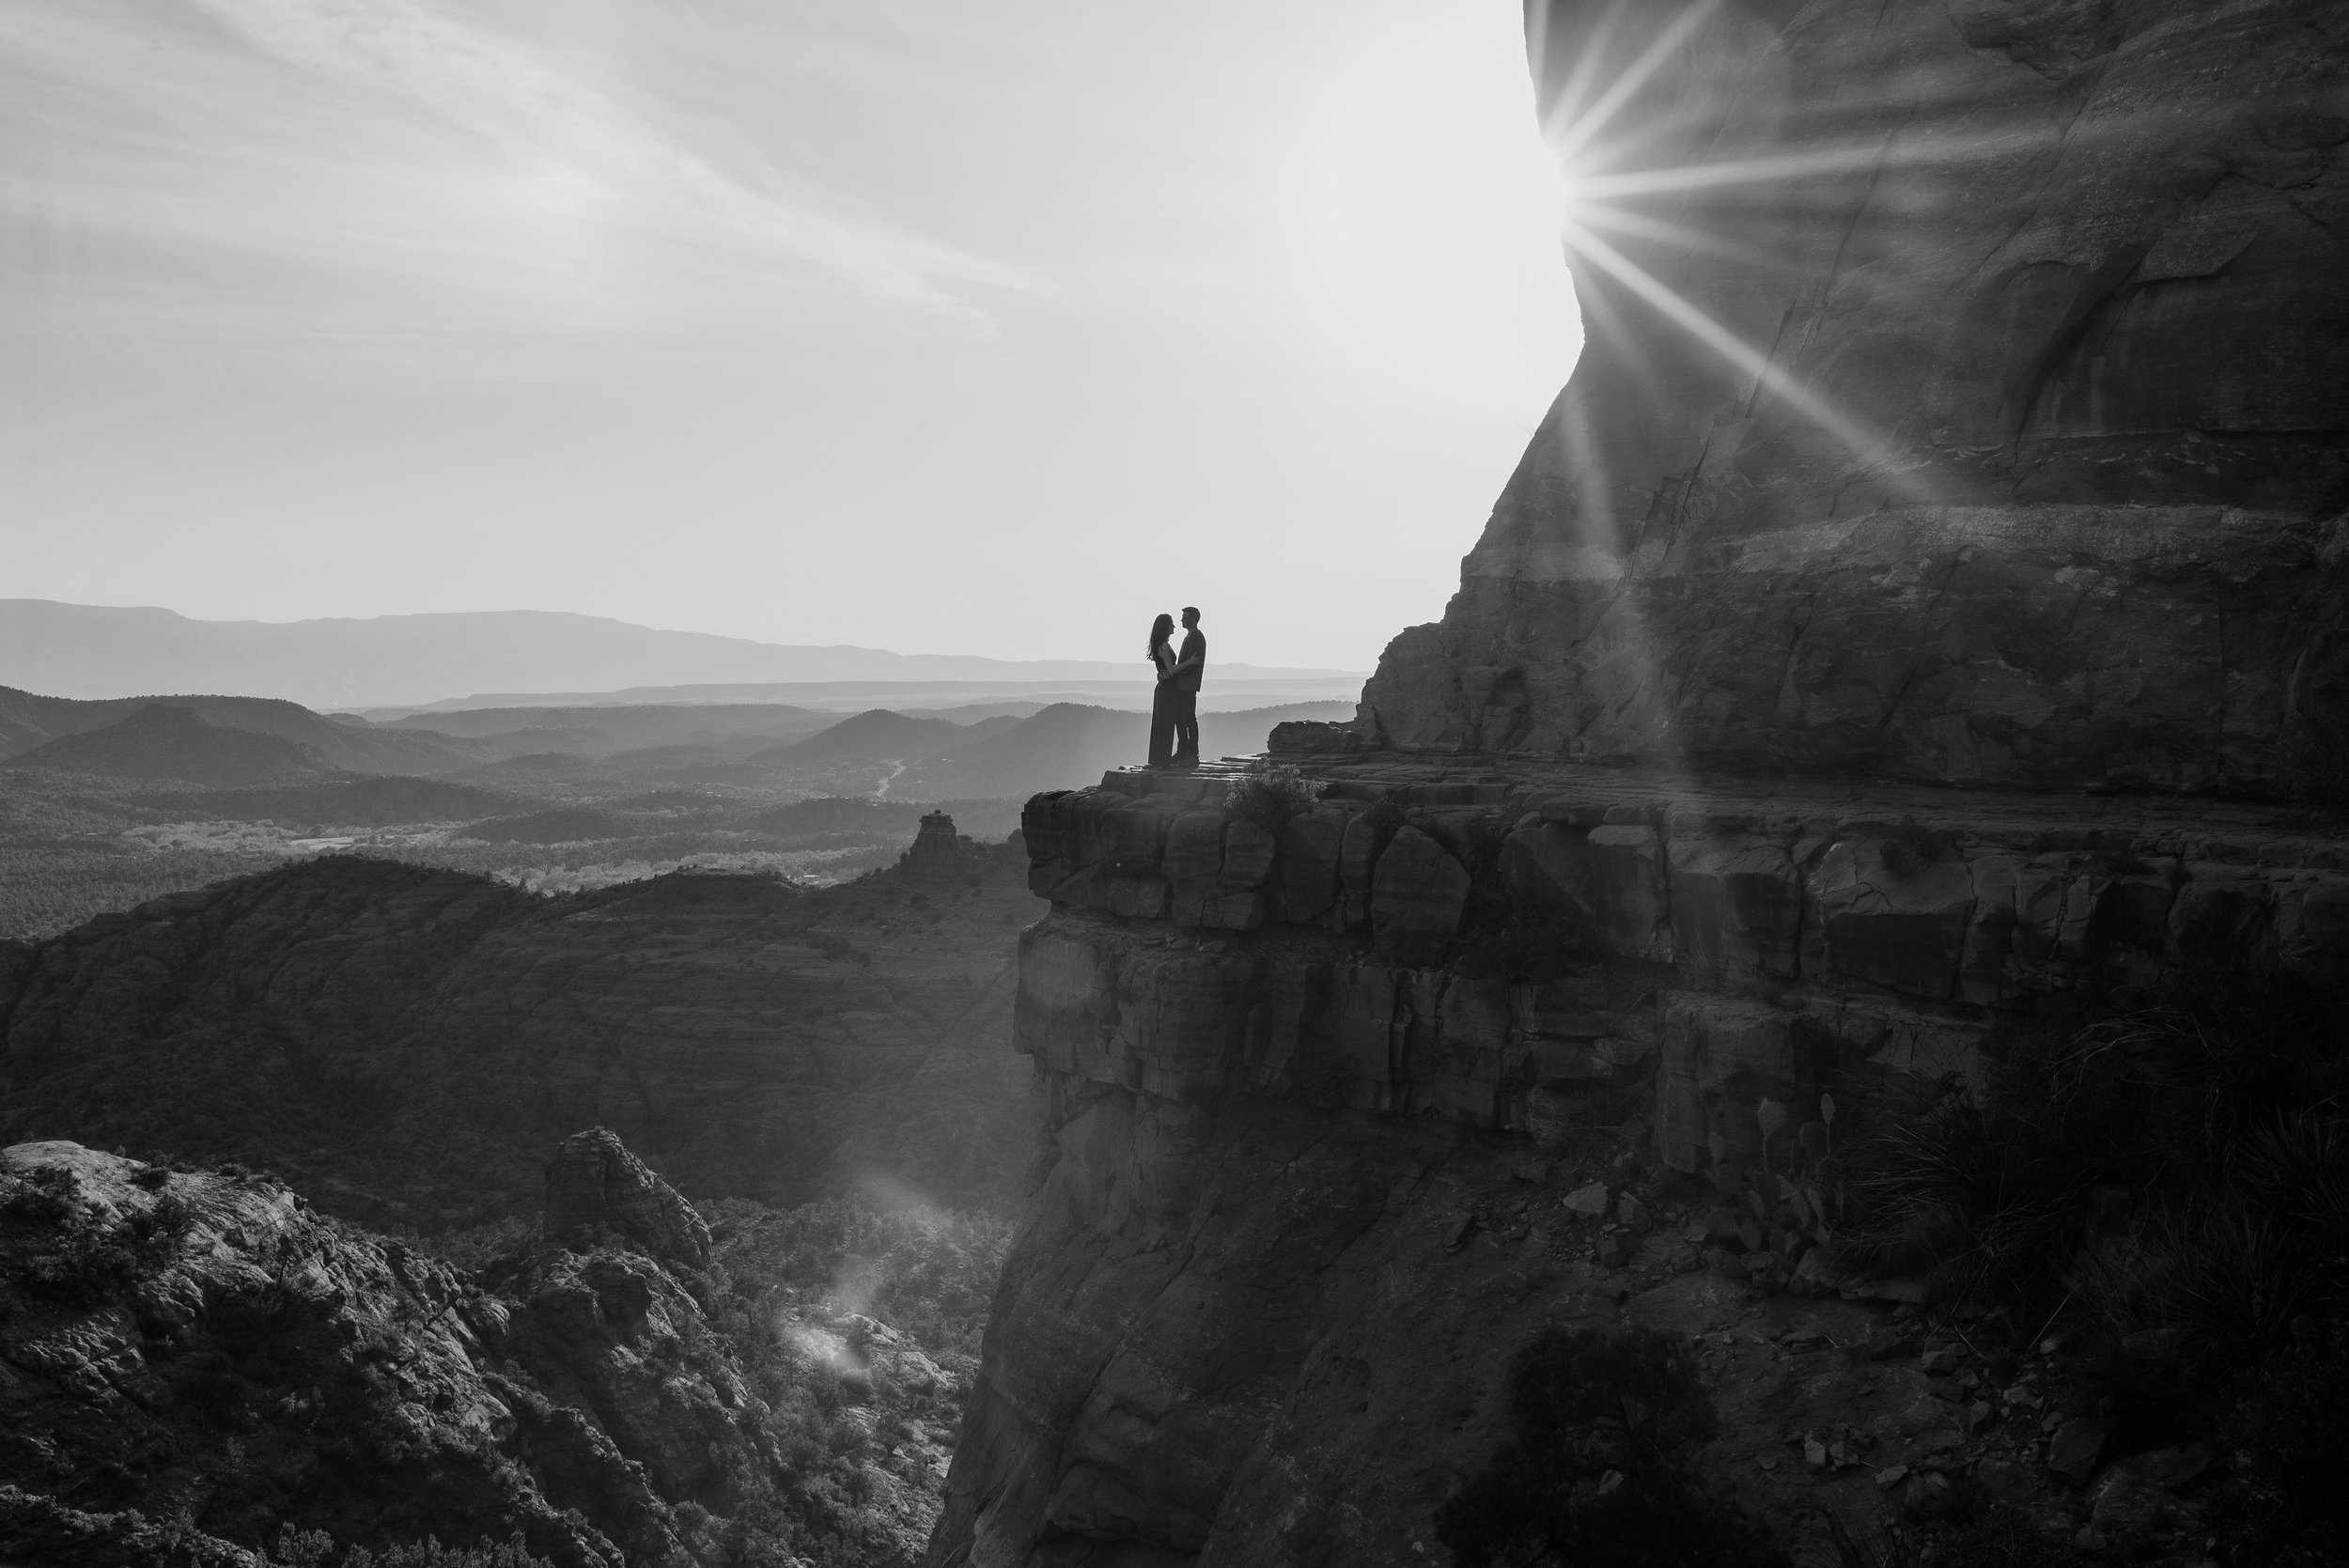 Isaiah-&-Taylor-Photography---Paul-&-Karen-Engagement,-Sedona-Arizona-076.jpg